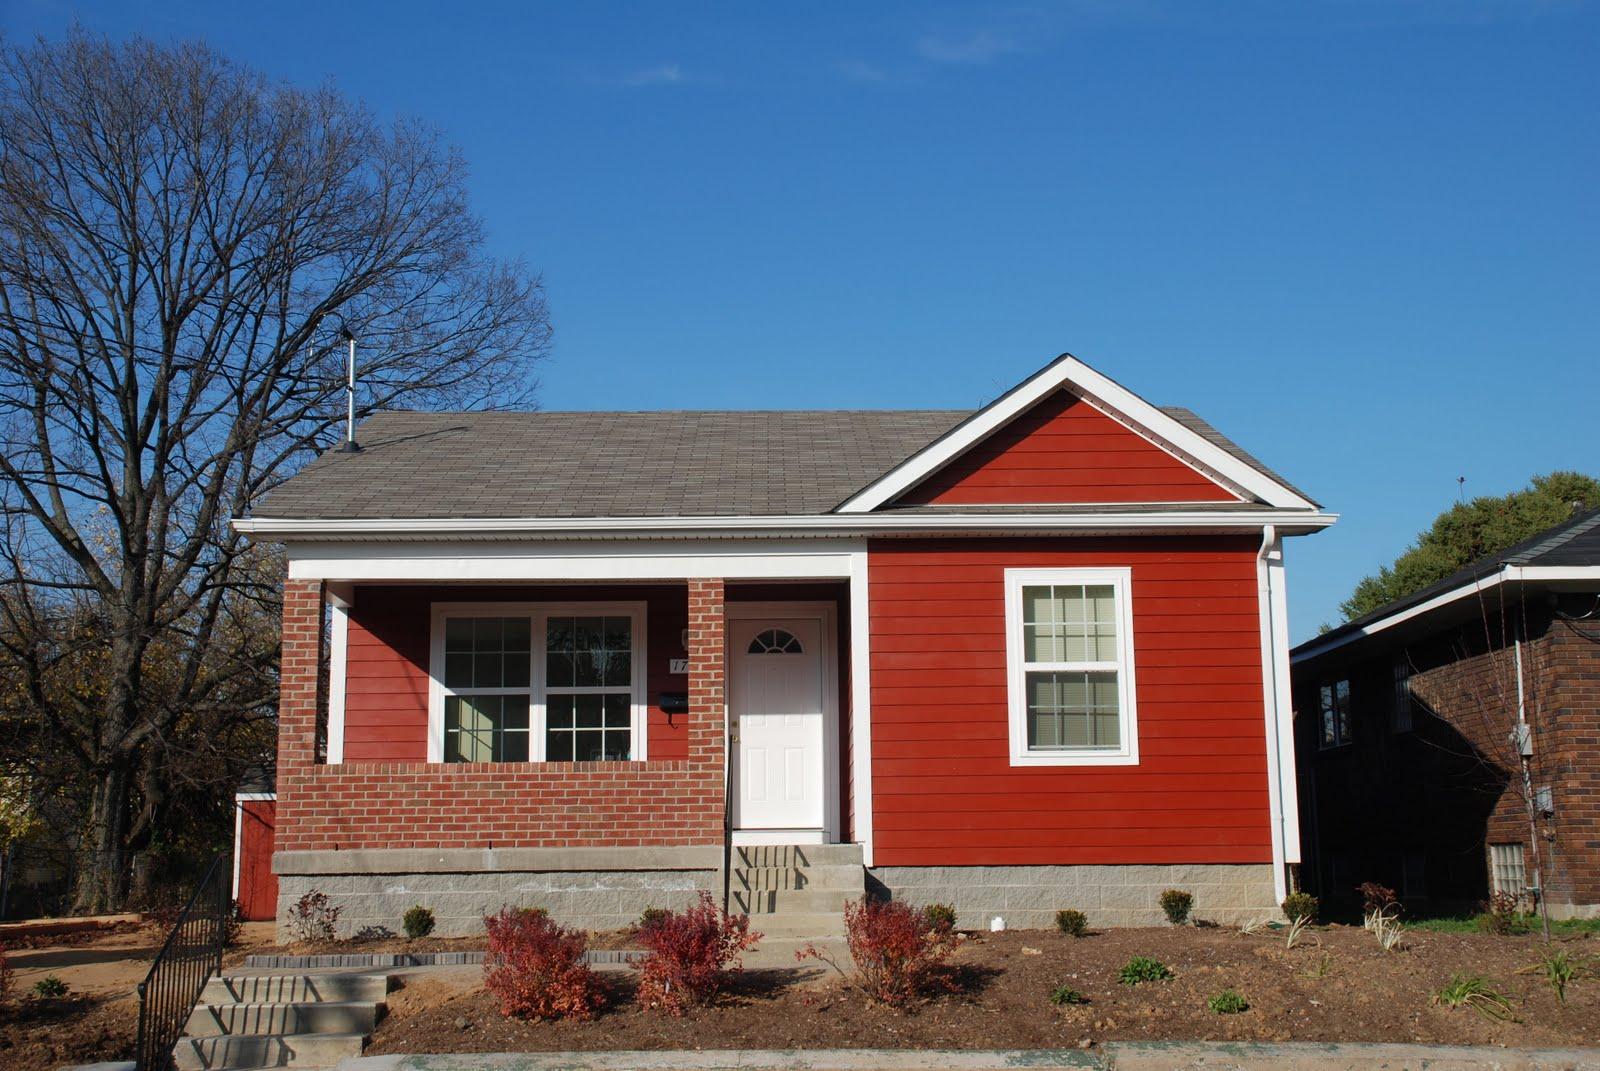 Aia ckc sponsored leed habitat home blog dedication tomorrow for Tomorrow homes